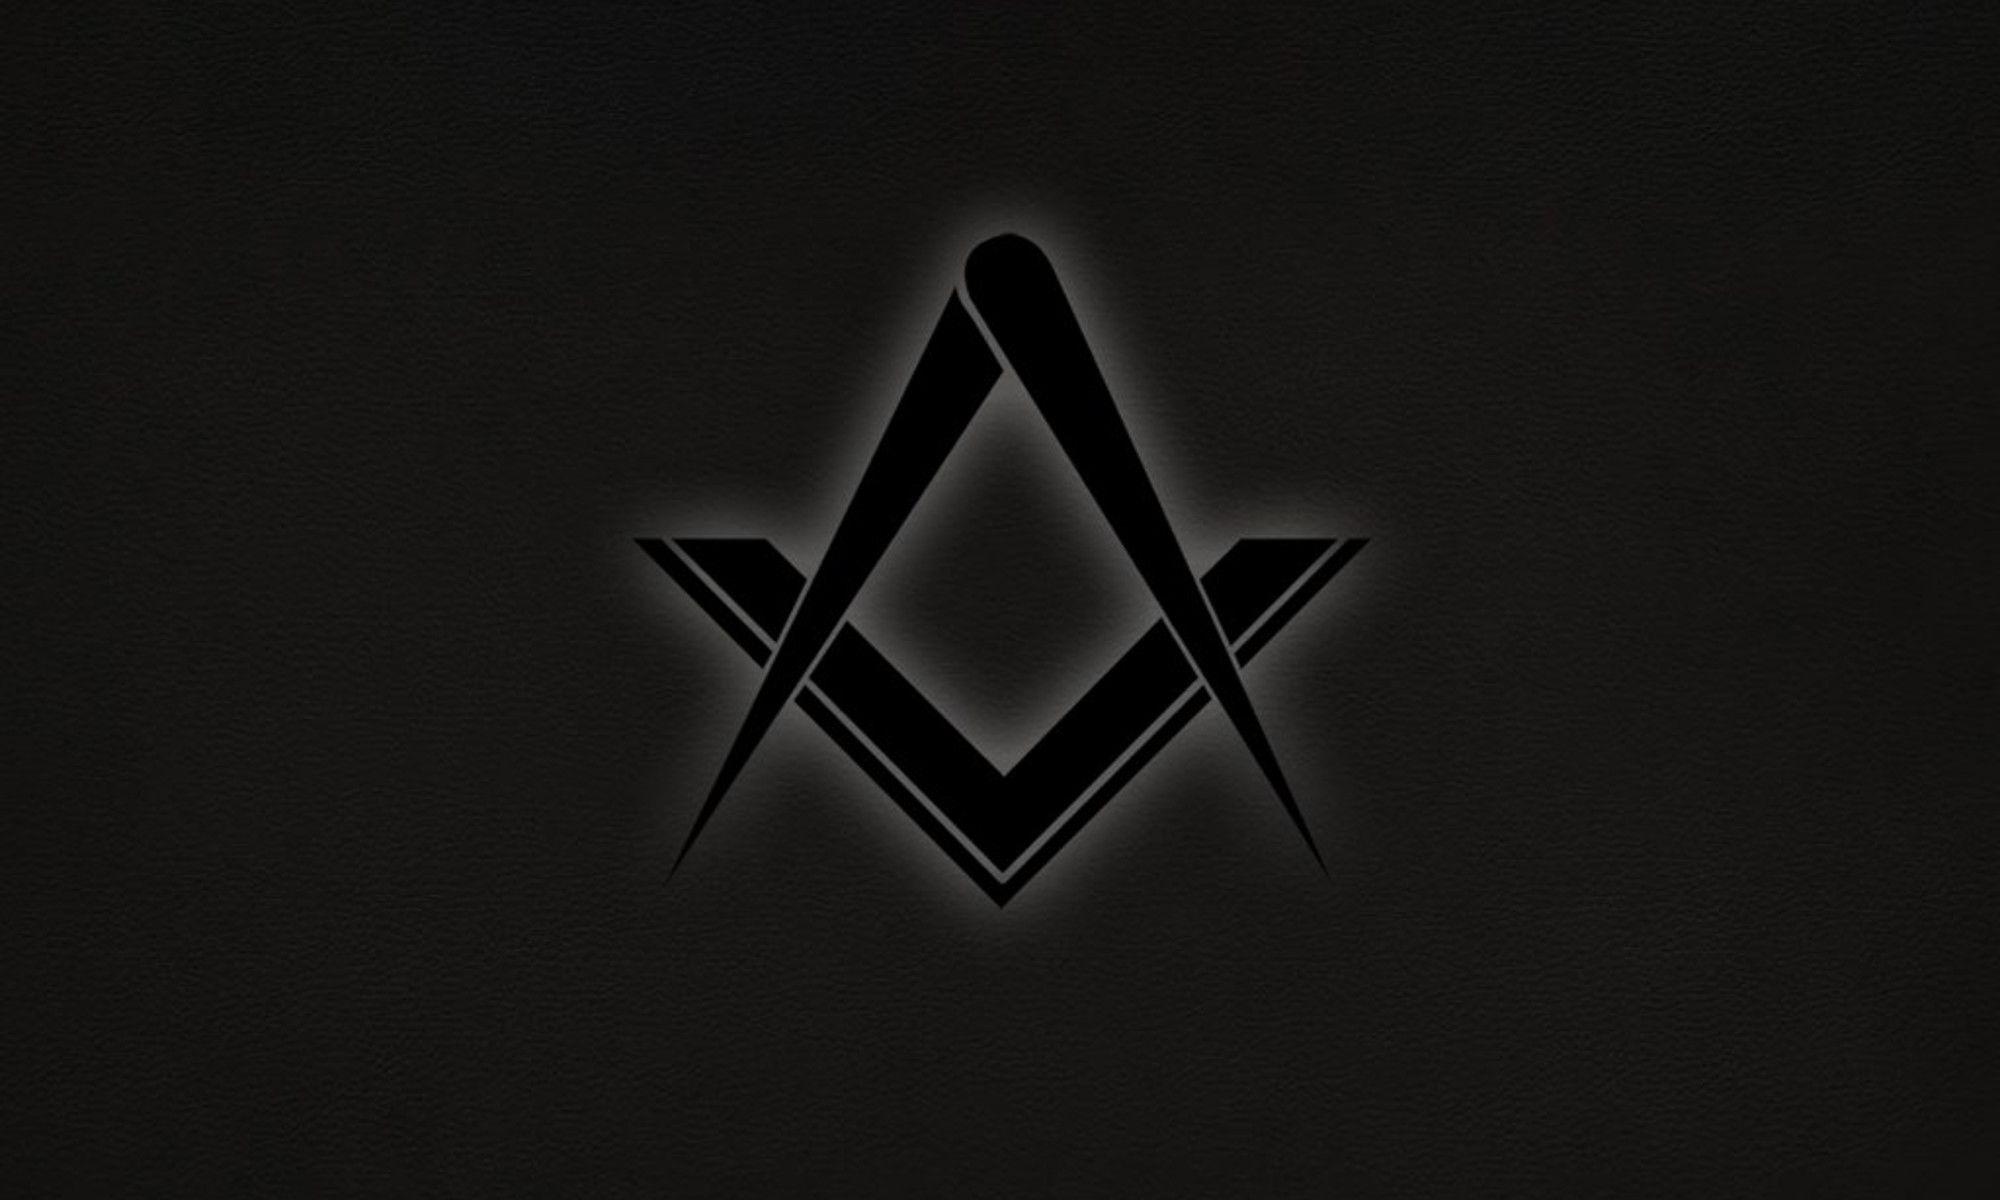 Masonic Wallpapers   Top Masonic Backgrounds   WallpaperAccess 2000x1200